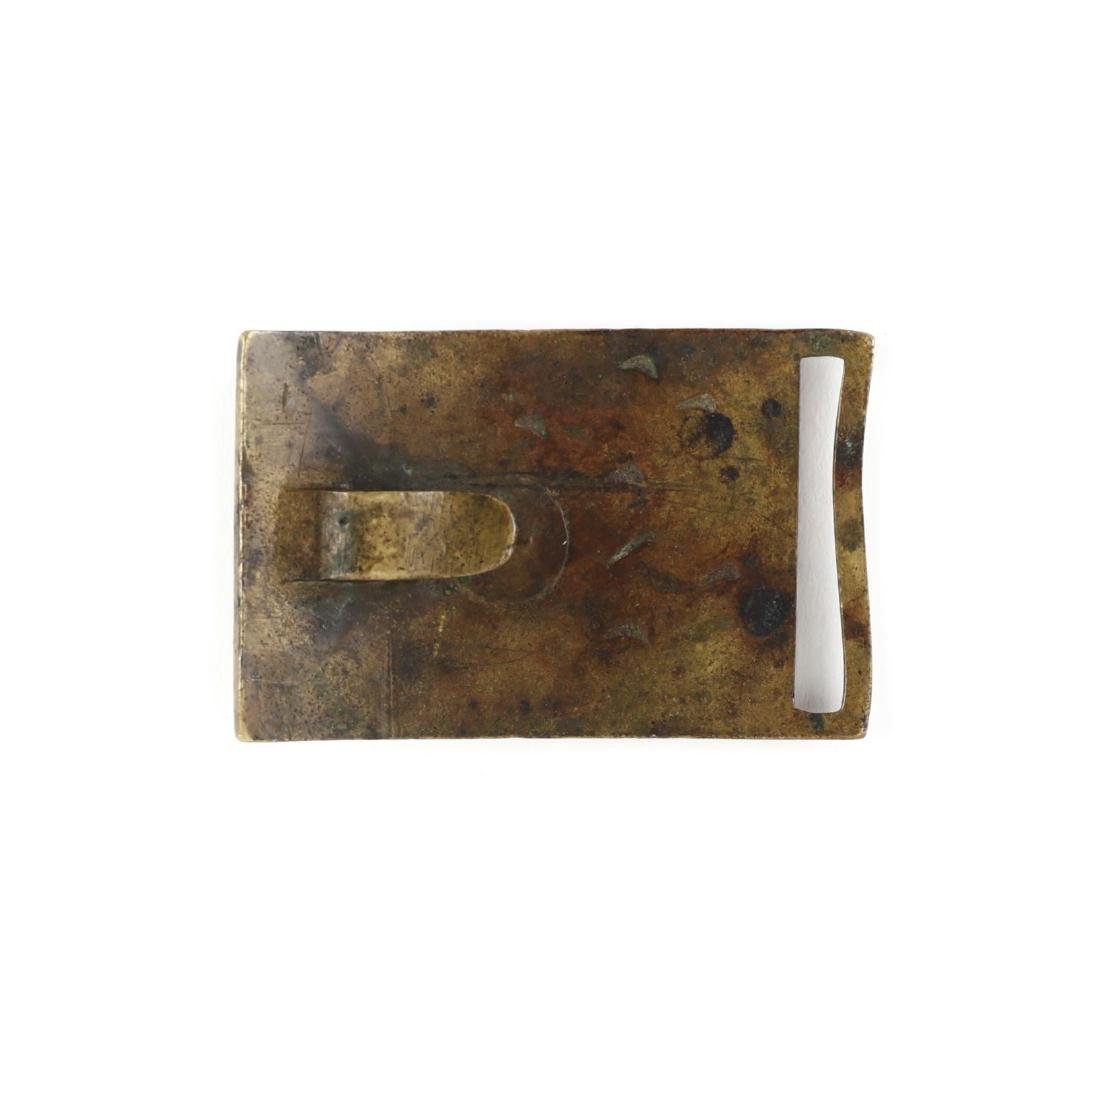 Regulation 1851 Pattern U. S. Army Belt Plate - 2